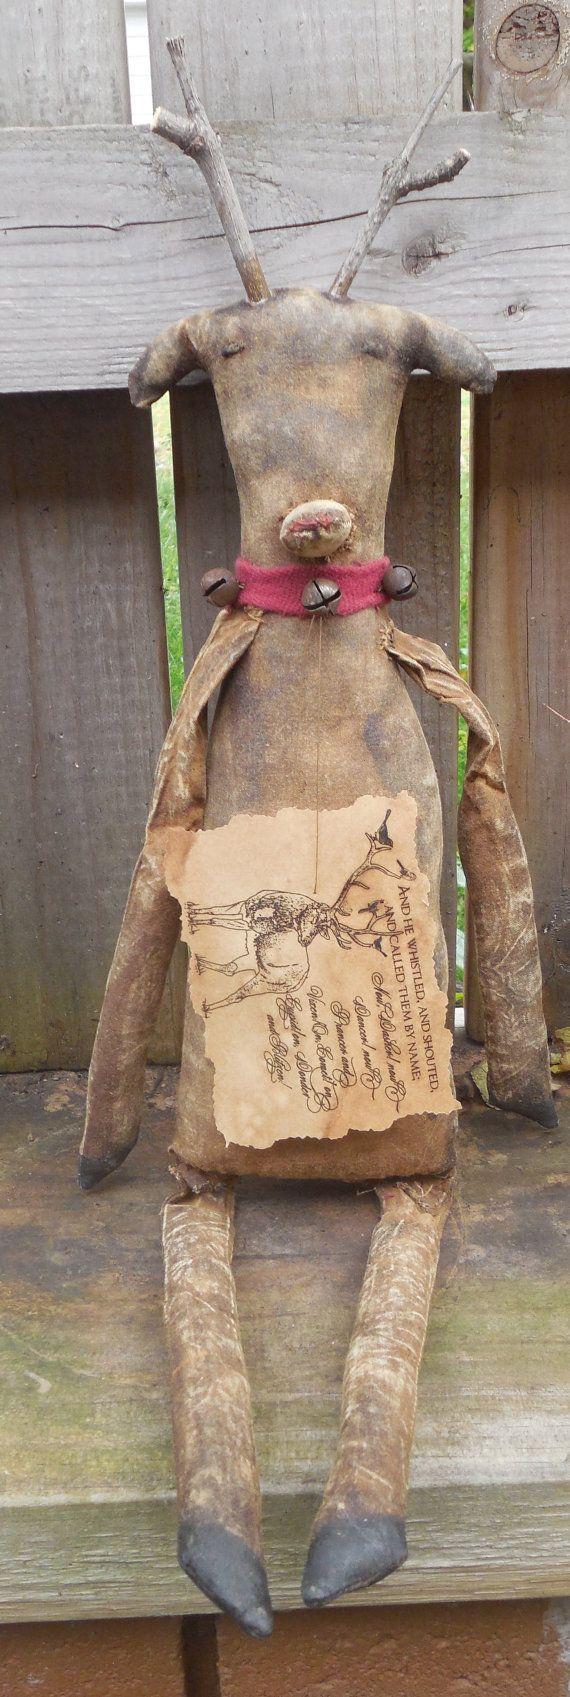 Primitive christmas craft ideas - 1 Primitive Christmas Rudolph Reindeer Animal By Crowsroostdolls